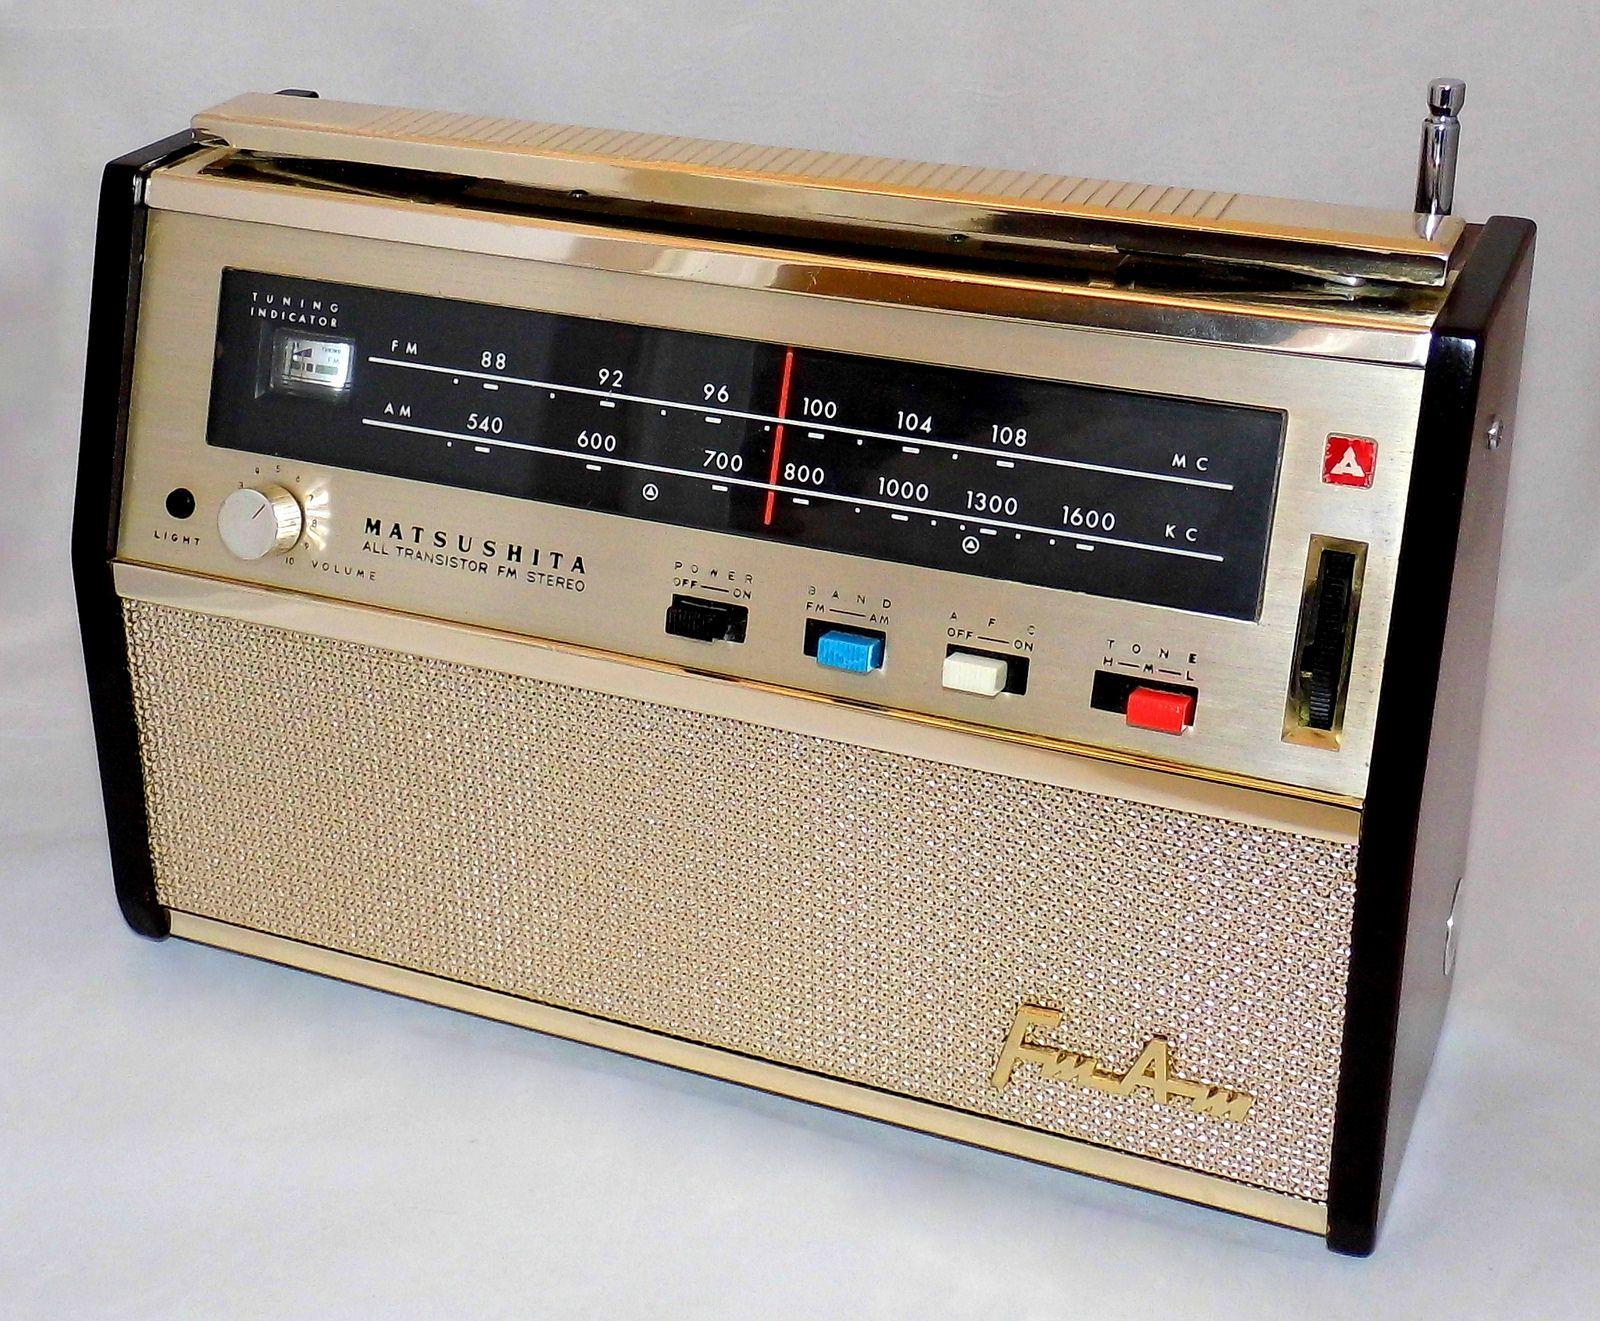 Vintage Matsushita Panasonic Portable Transistor Radio Model T 35 Fm Am Bands 10 Transistors Made In Japan Circa 1961 Vintage Radio Transistor Radio Vintage Transistor Radio